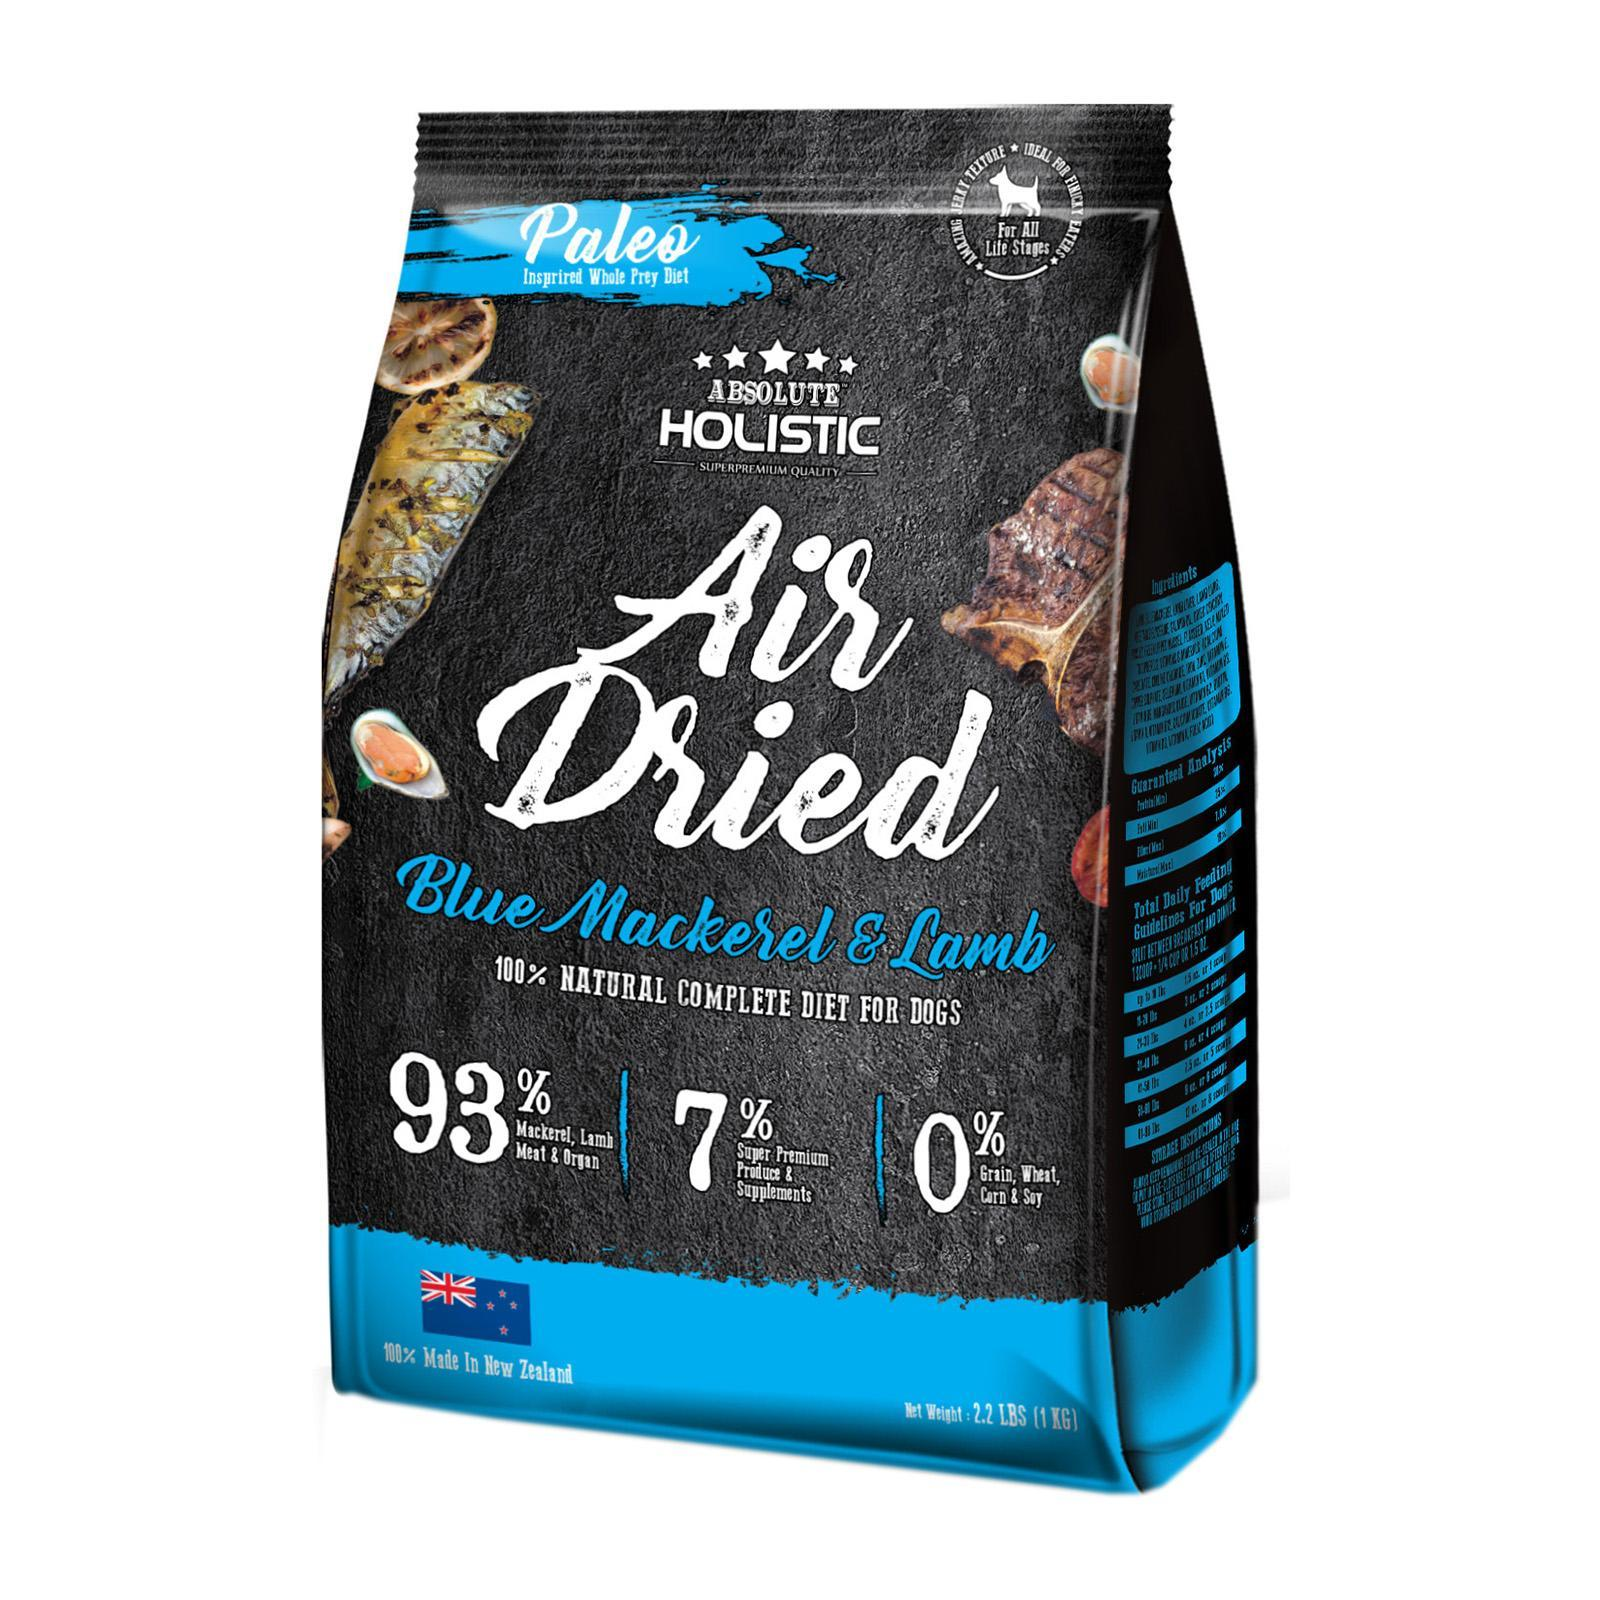 Absolute Holistic Air Dried Blue Mackerel And Lamb (Dog)